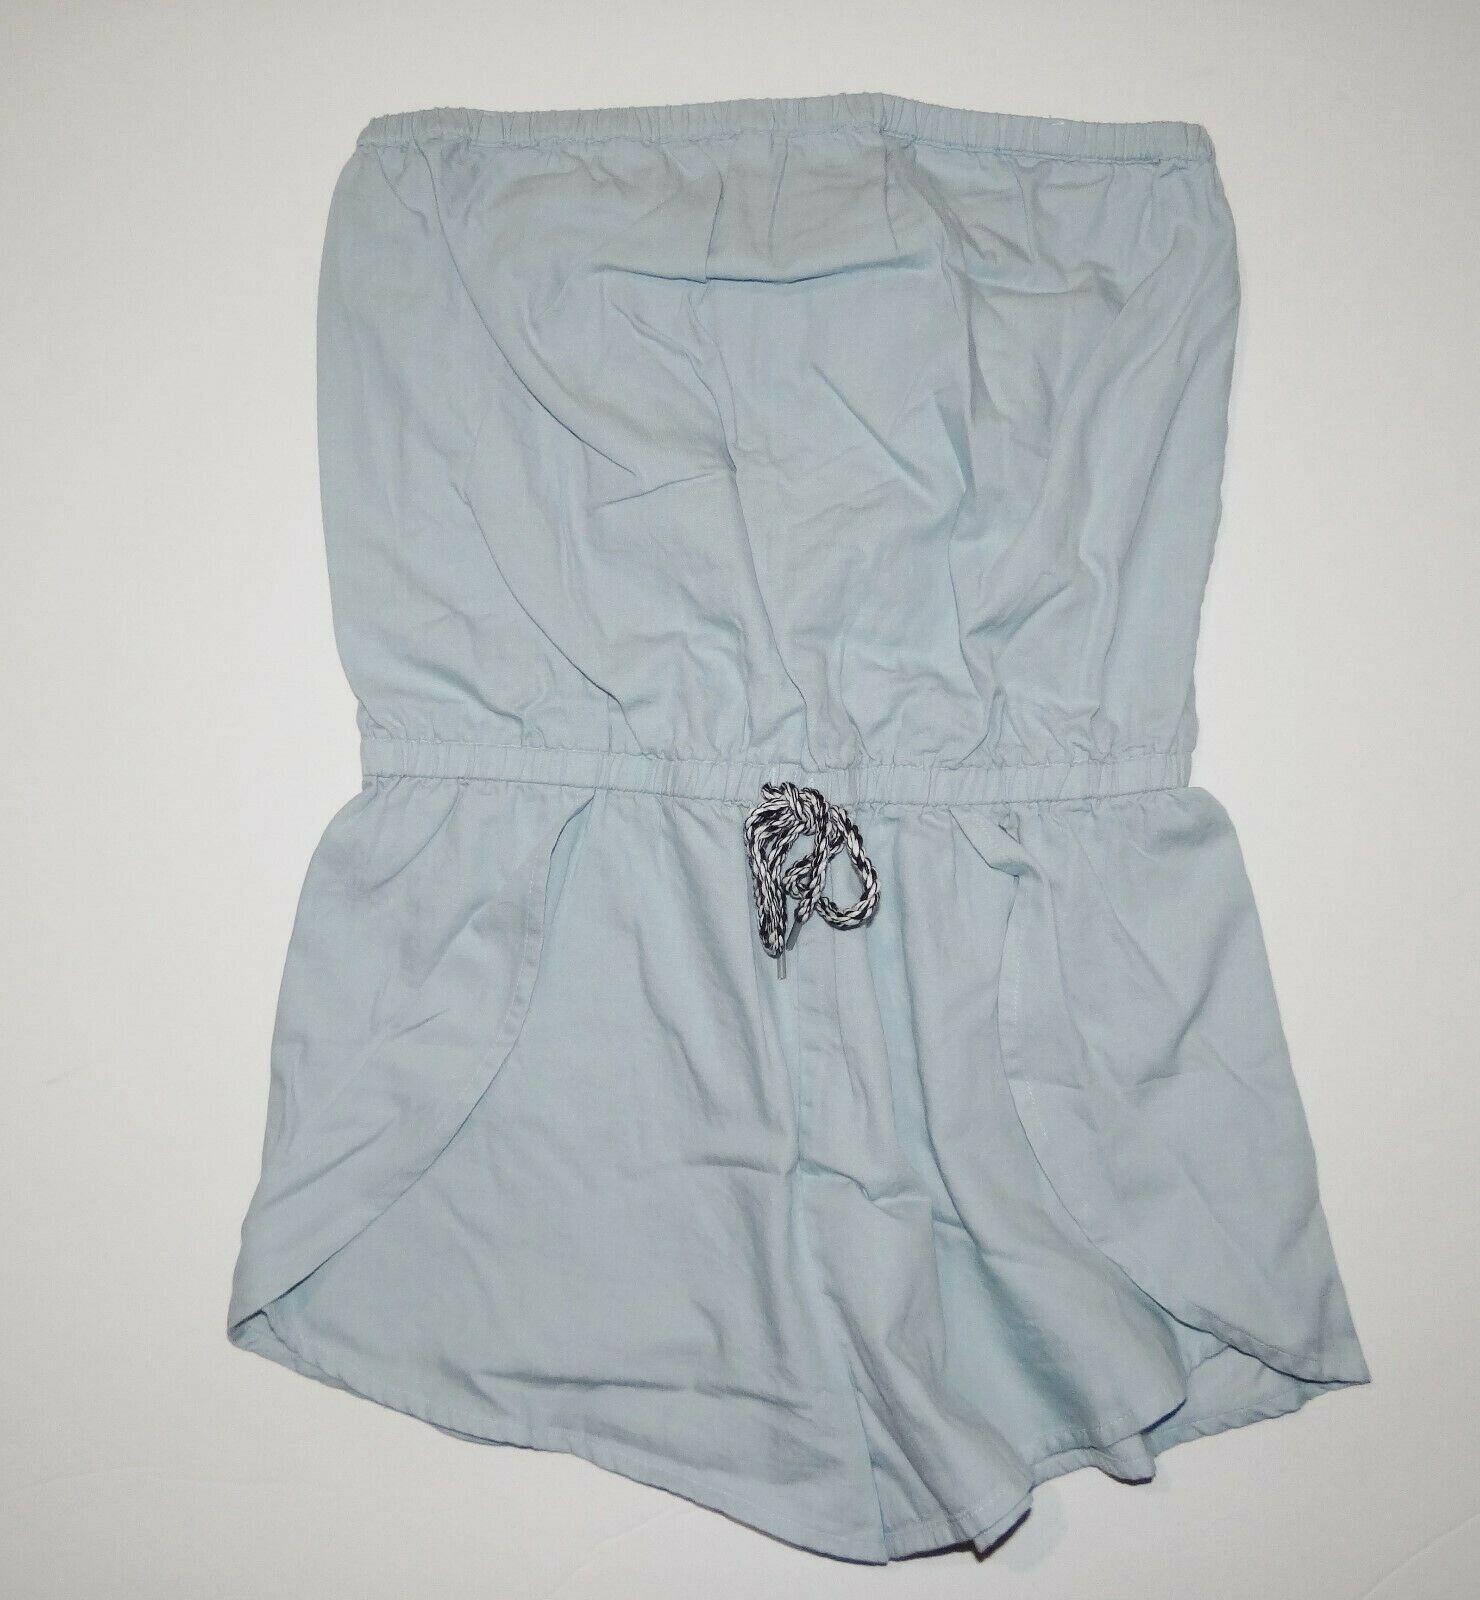 New Vans Womens Mars Cotton Denim Romper Shorts Size Small